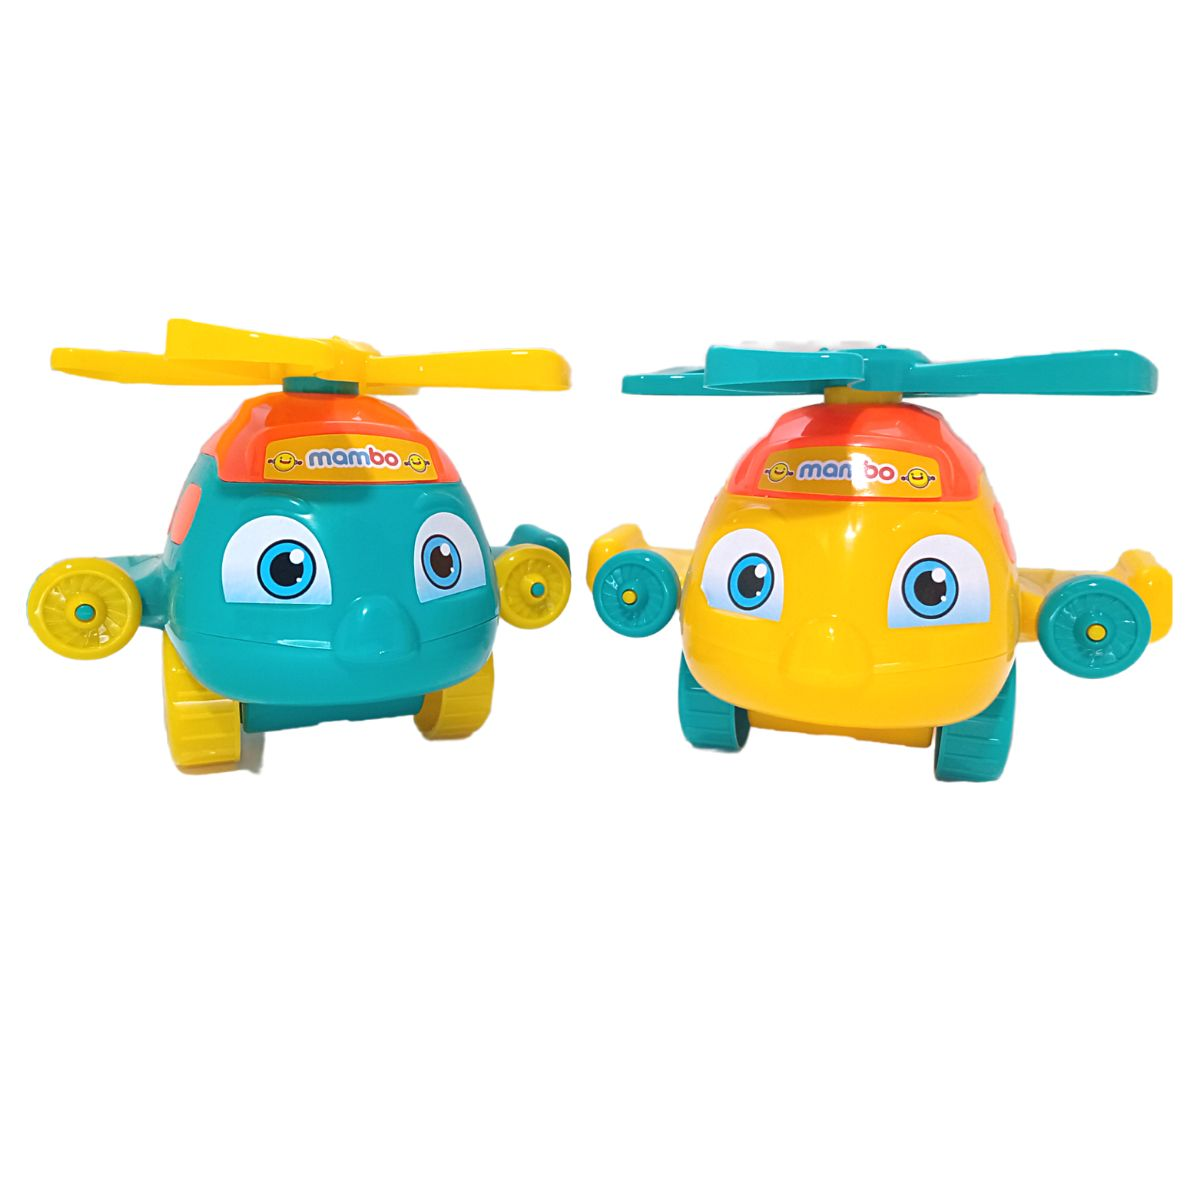 Avião Push Plane Helicóptero P/Bebês Educativo Bs toys Cores Sortidas